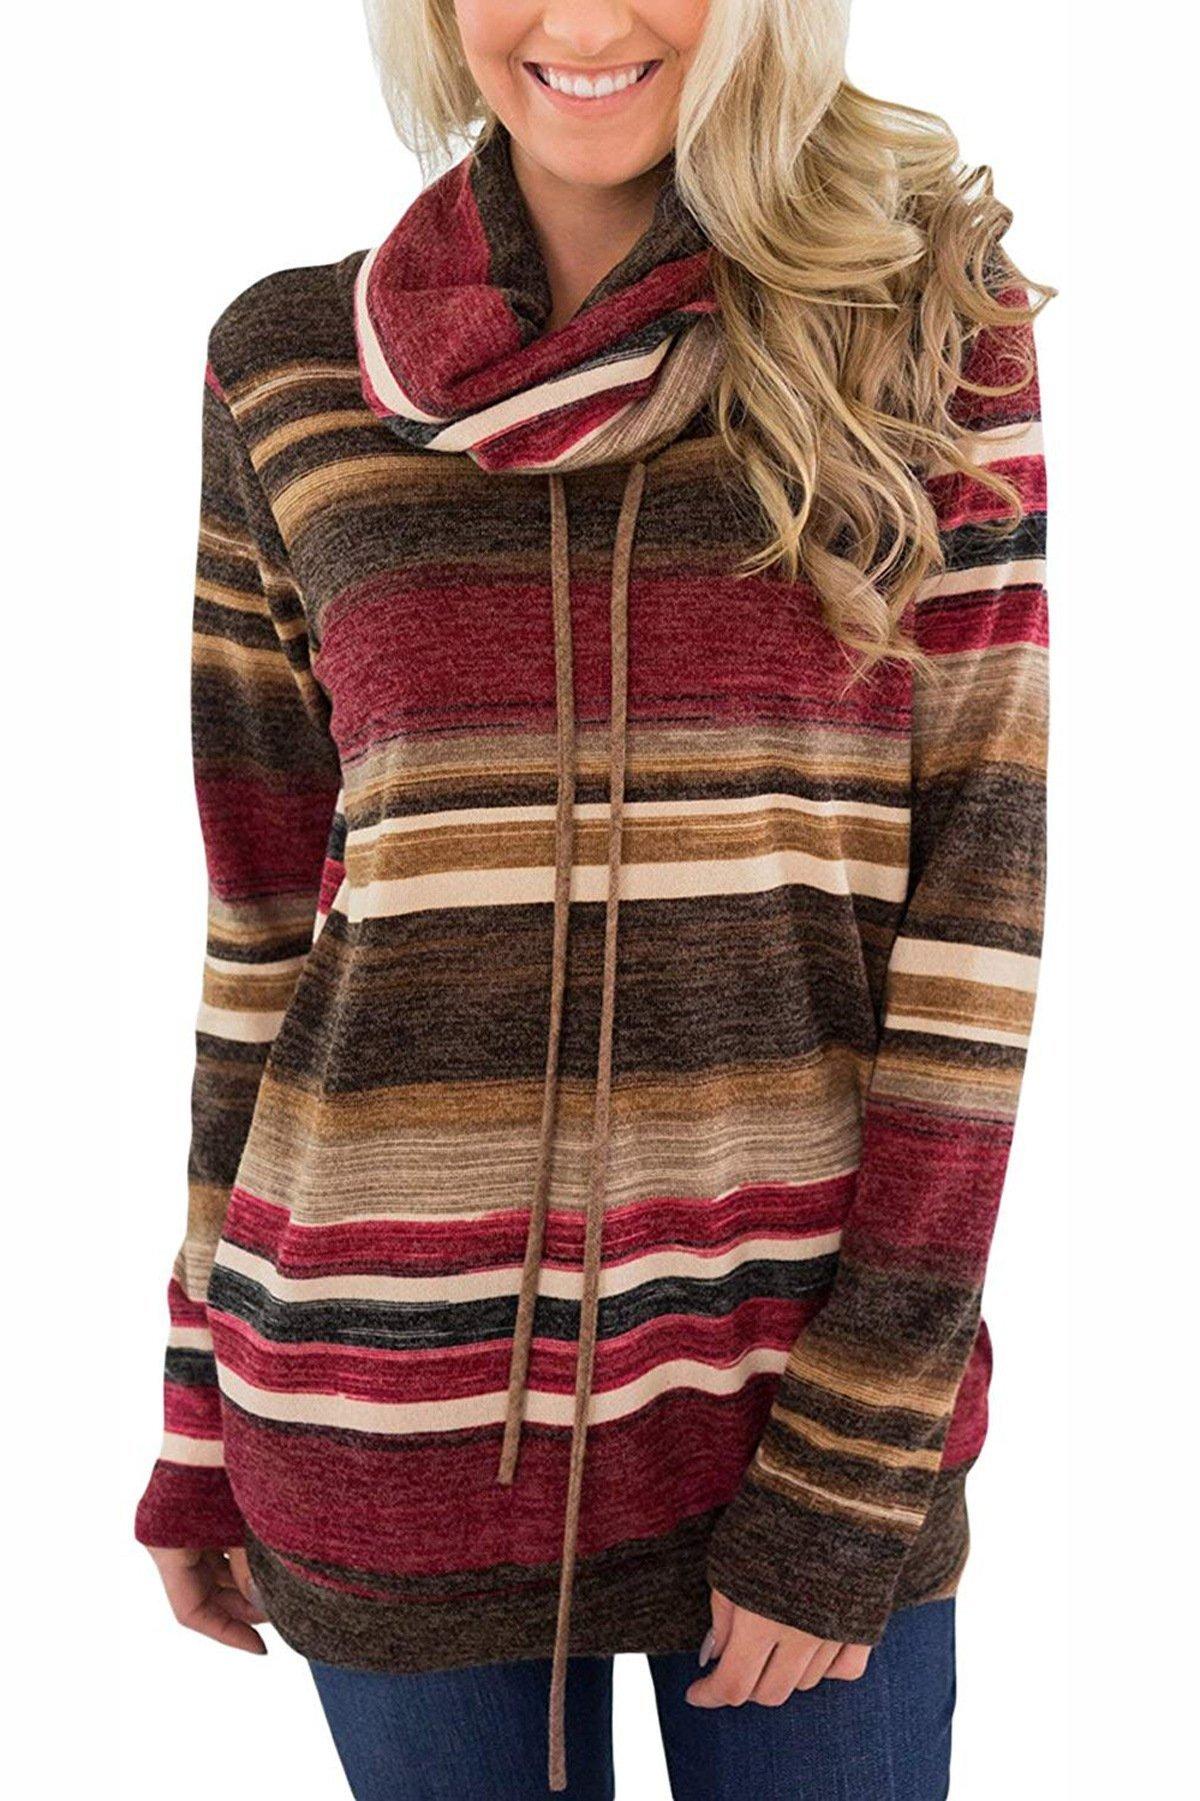 MBQMBSS Womens Sweatshirt Cowl Neck Long Sleeve Striped Pocket Drawstring Pullover Top Sweatshirt (L, red)